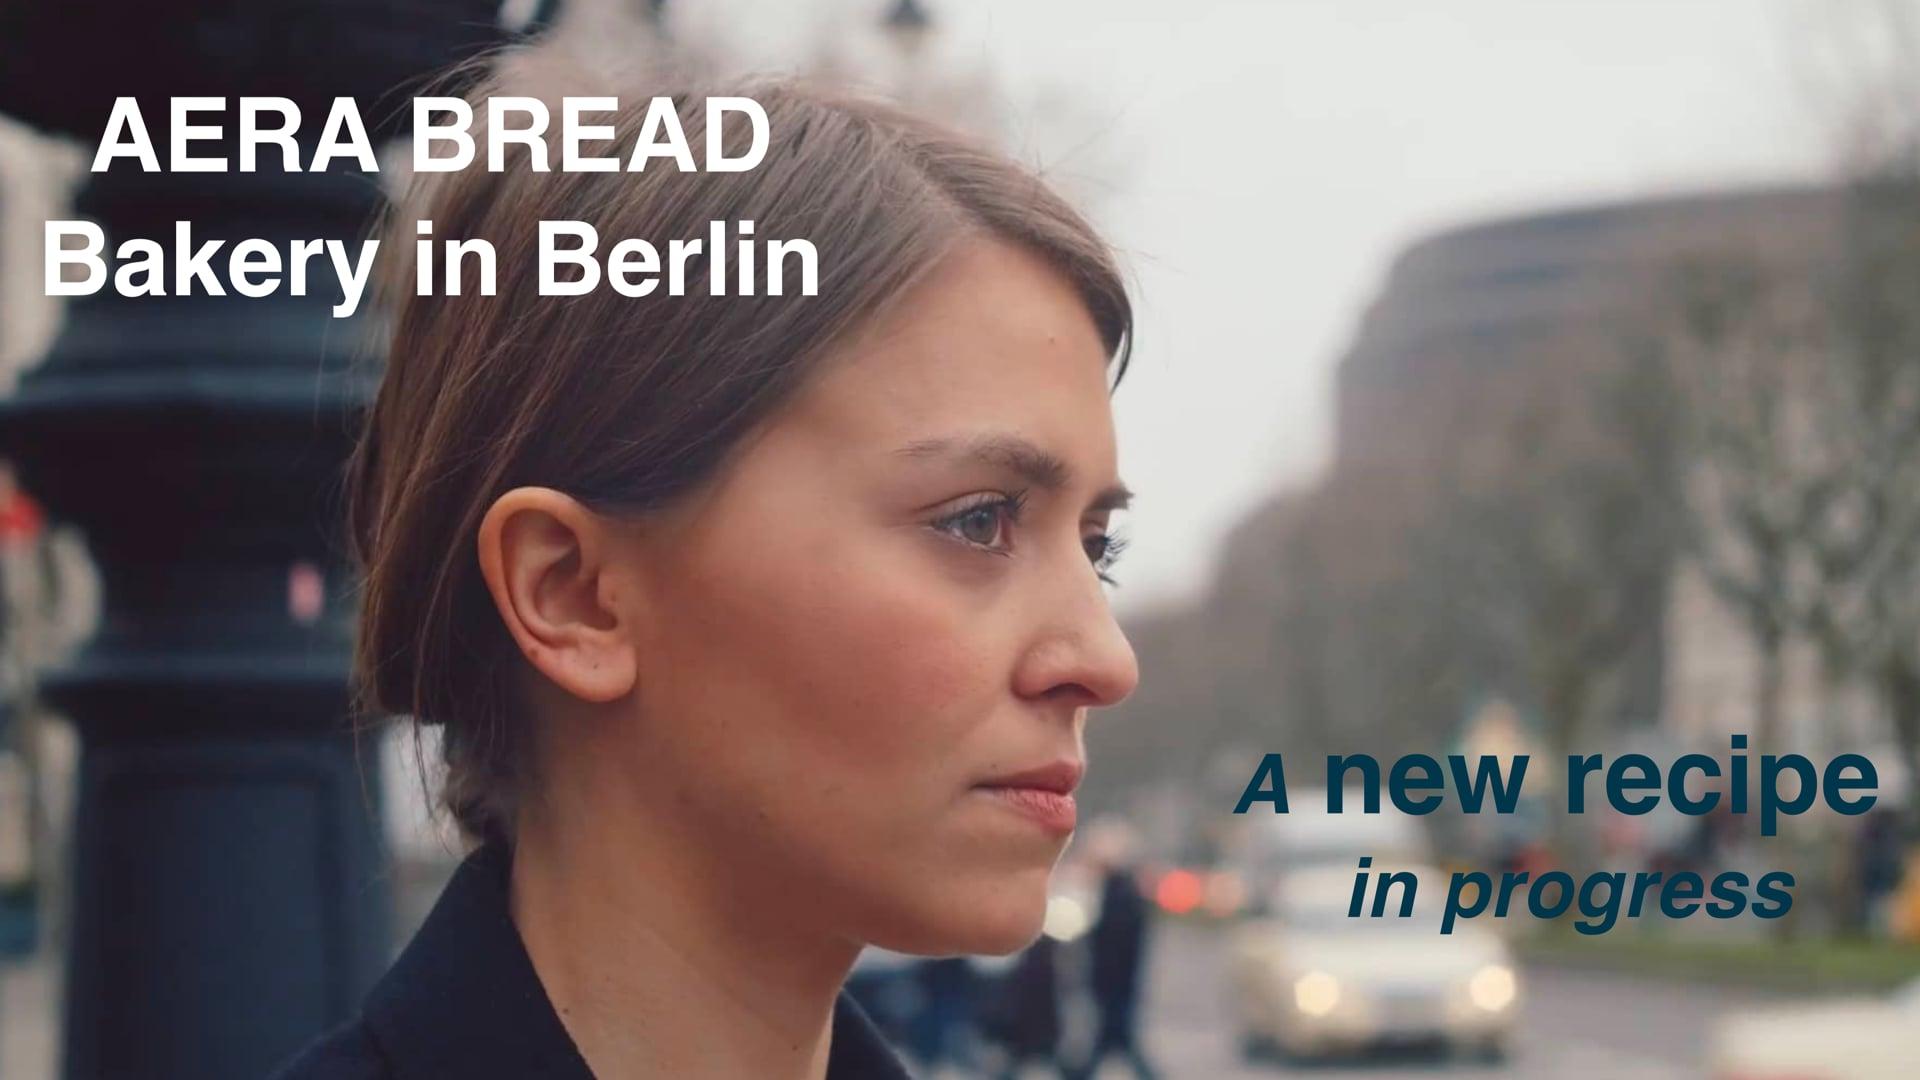 AERA BREAD .mov